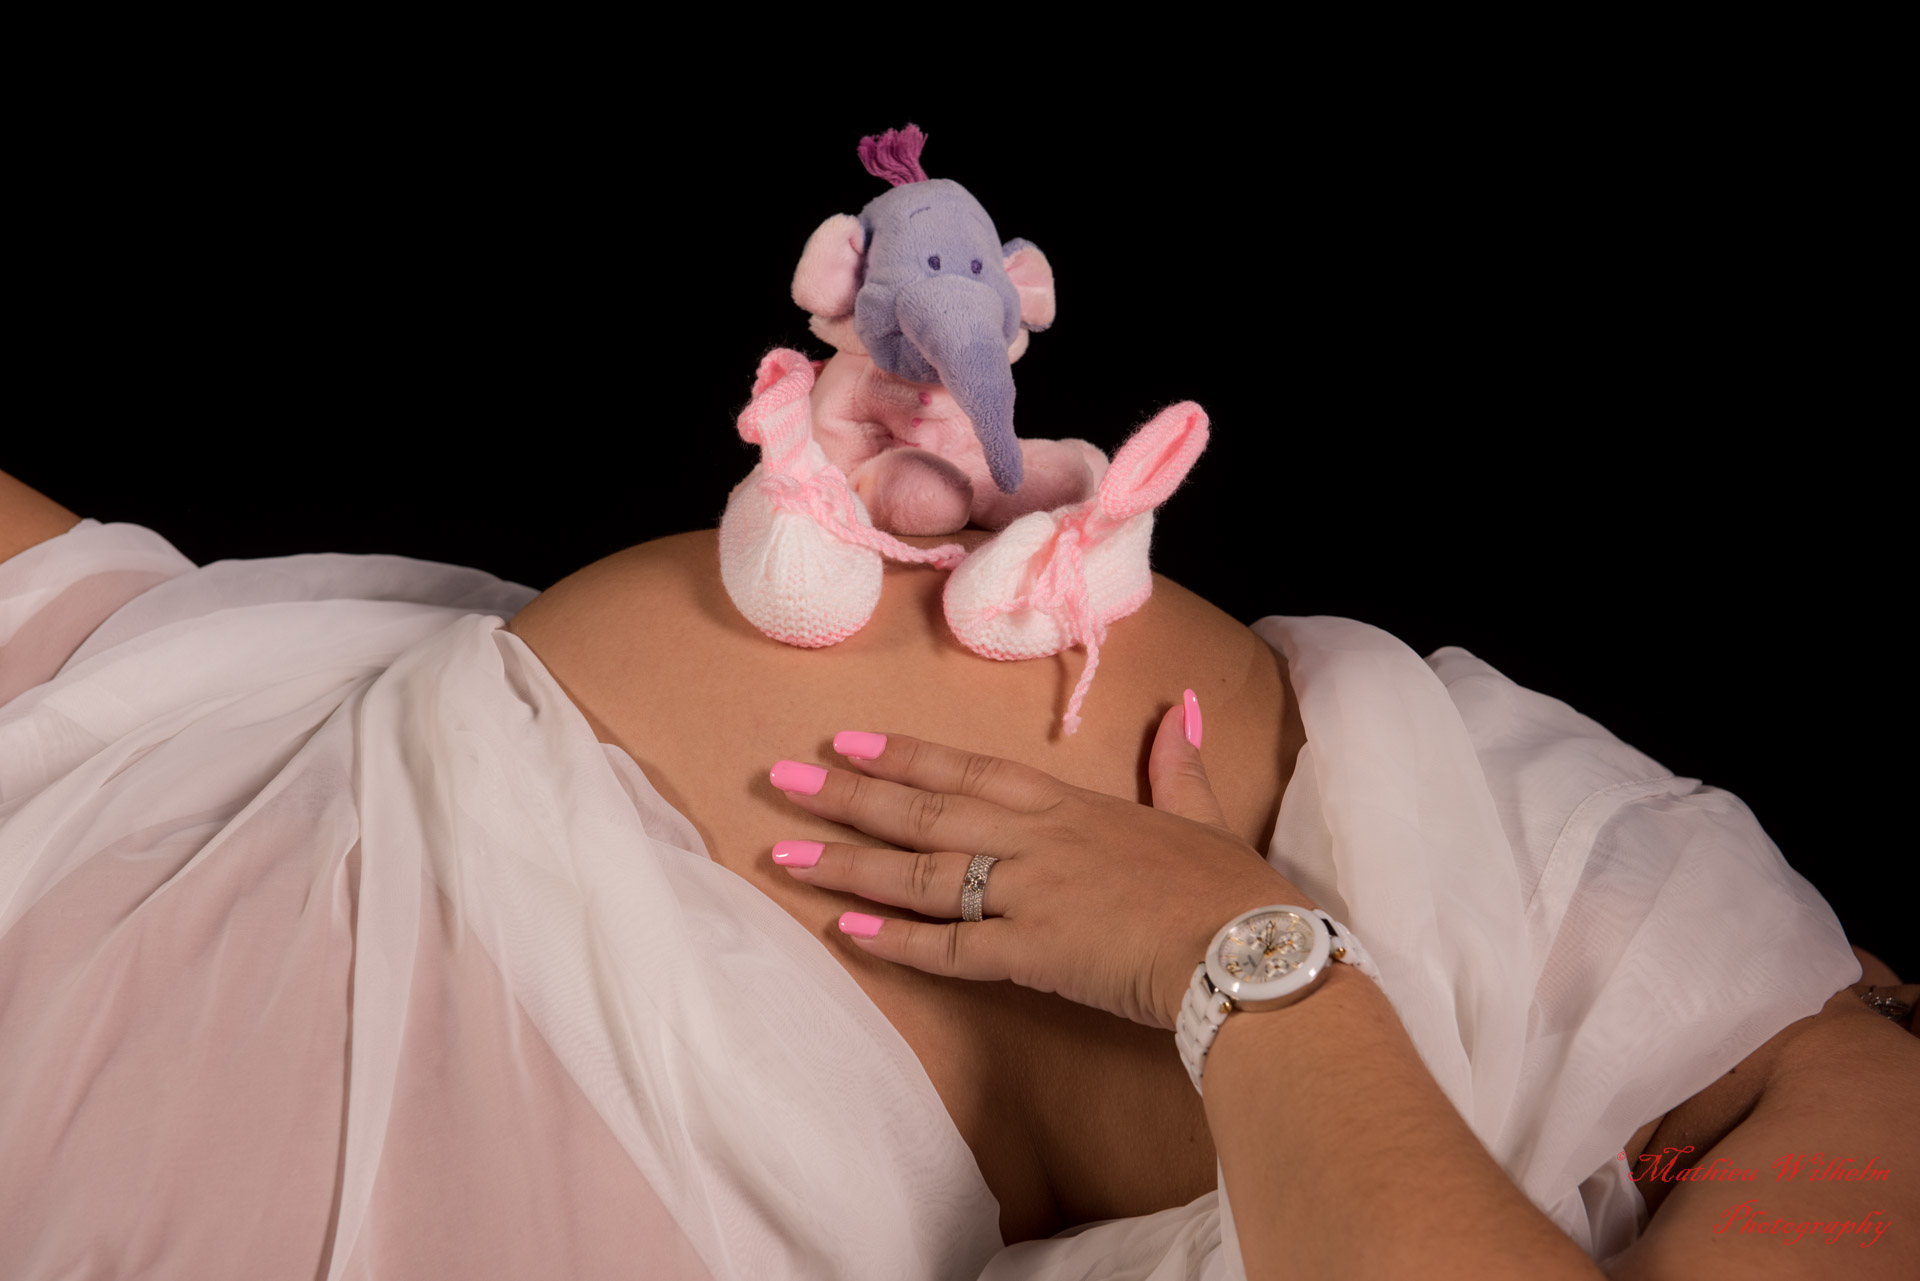 2018-07-23 Marylou grossesse fond noir (